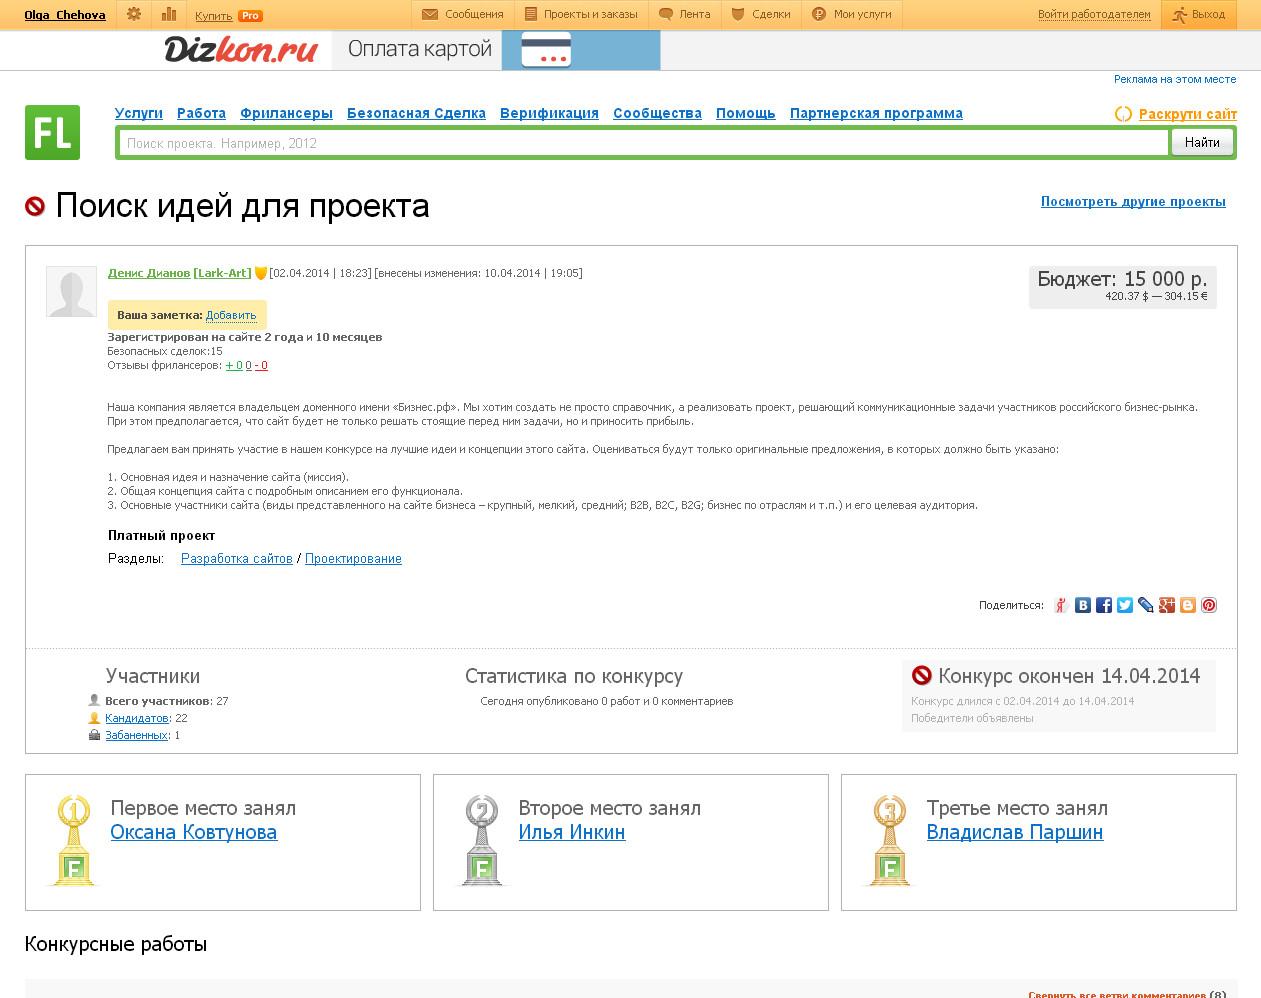 1 МЕСТО В КОНКУРСЕ: Концепция сайта Бизнес.РФ